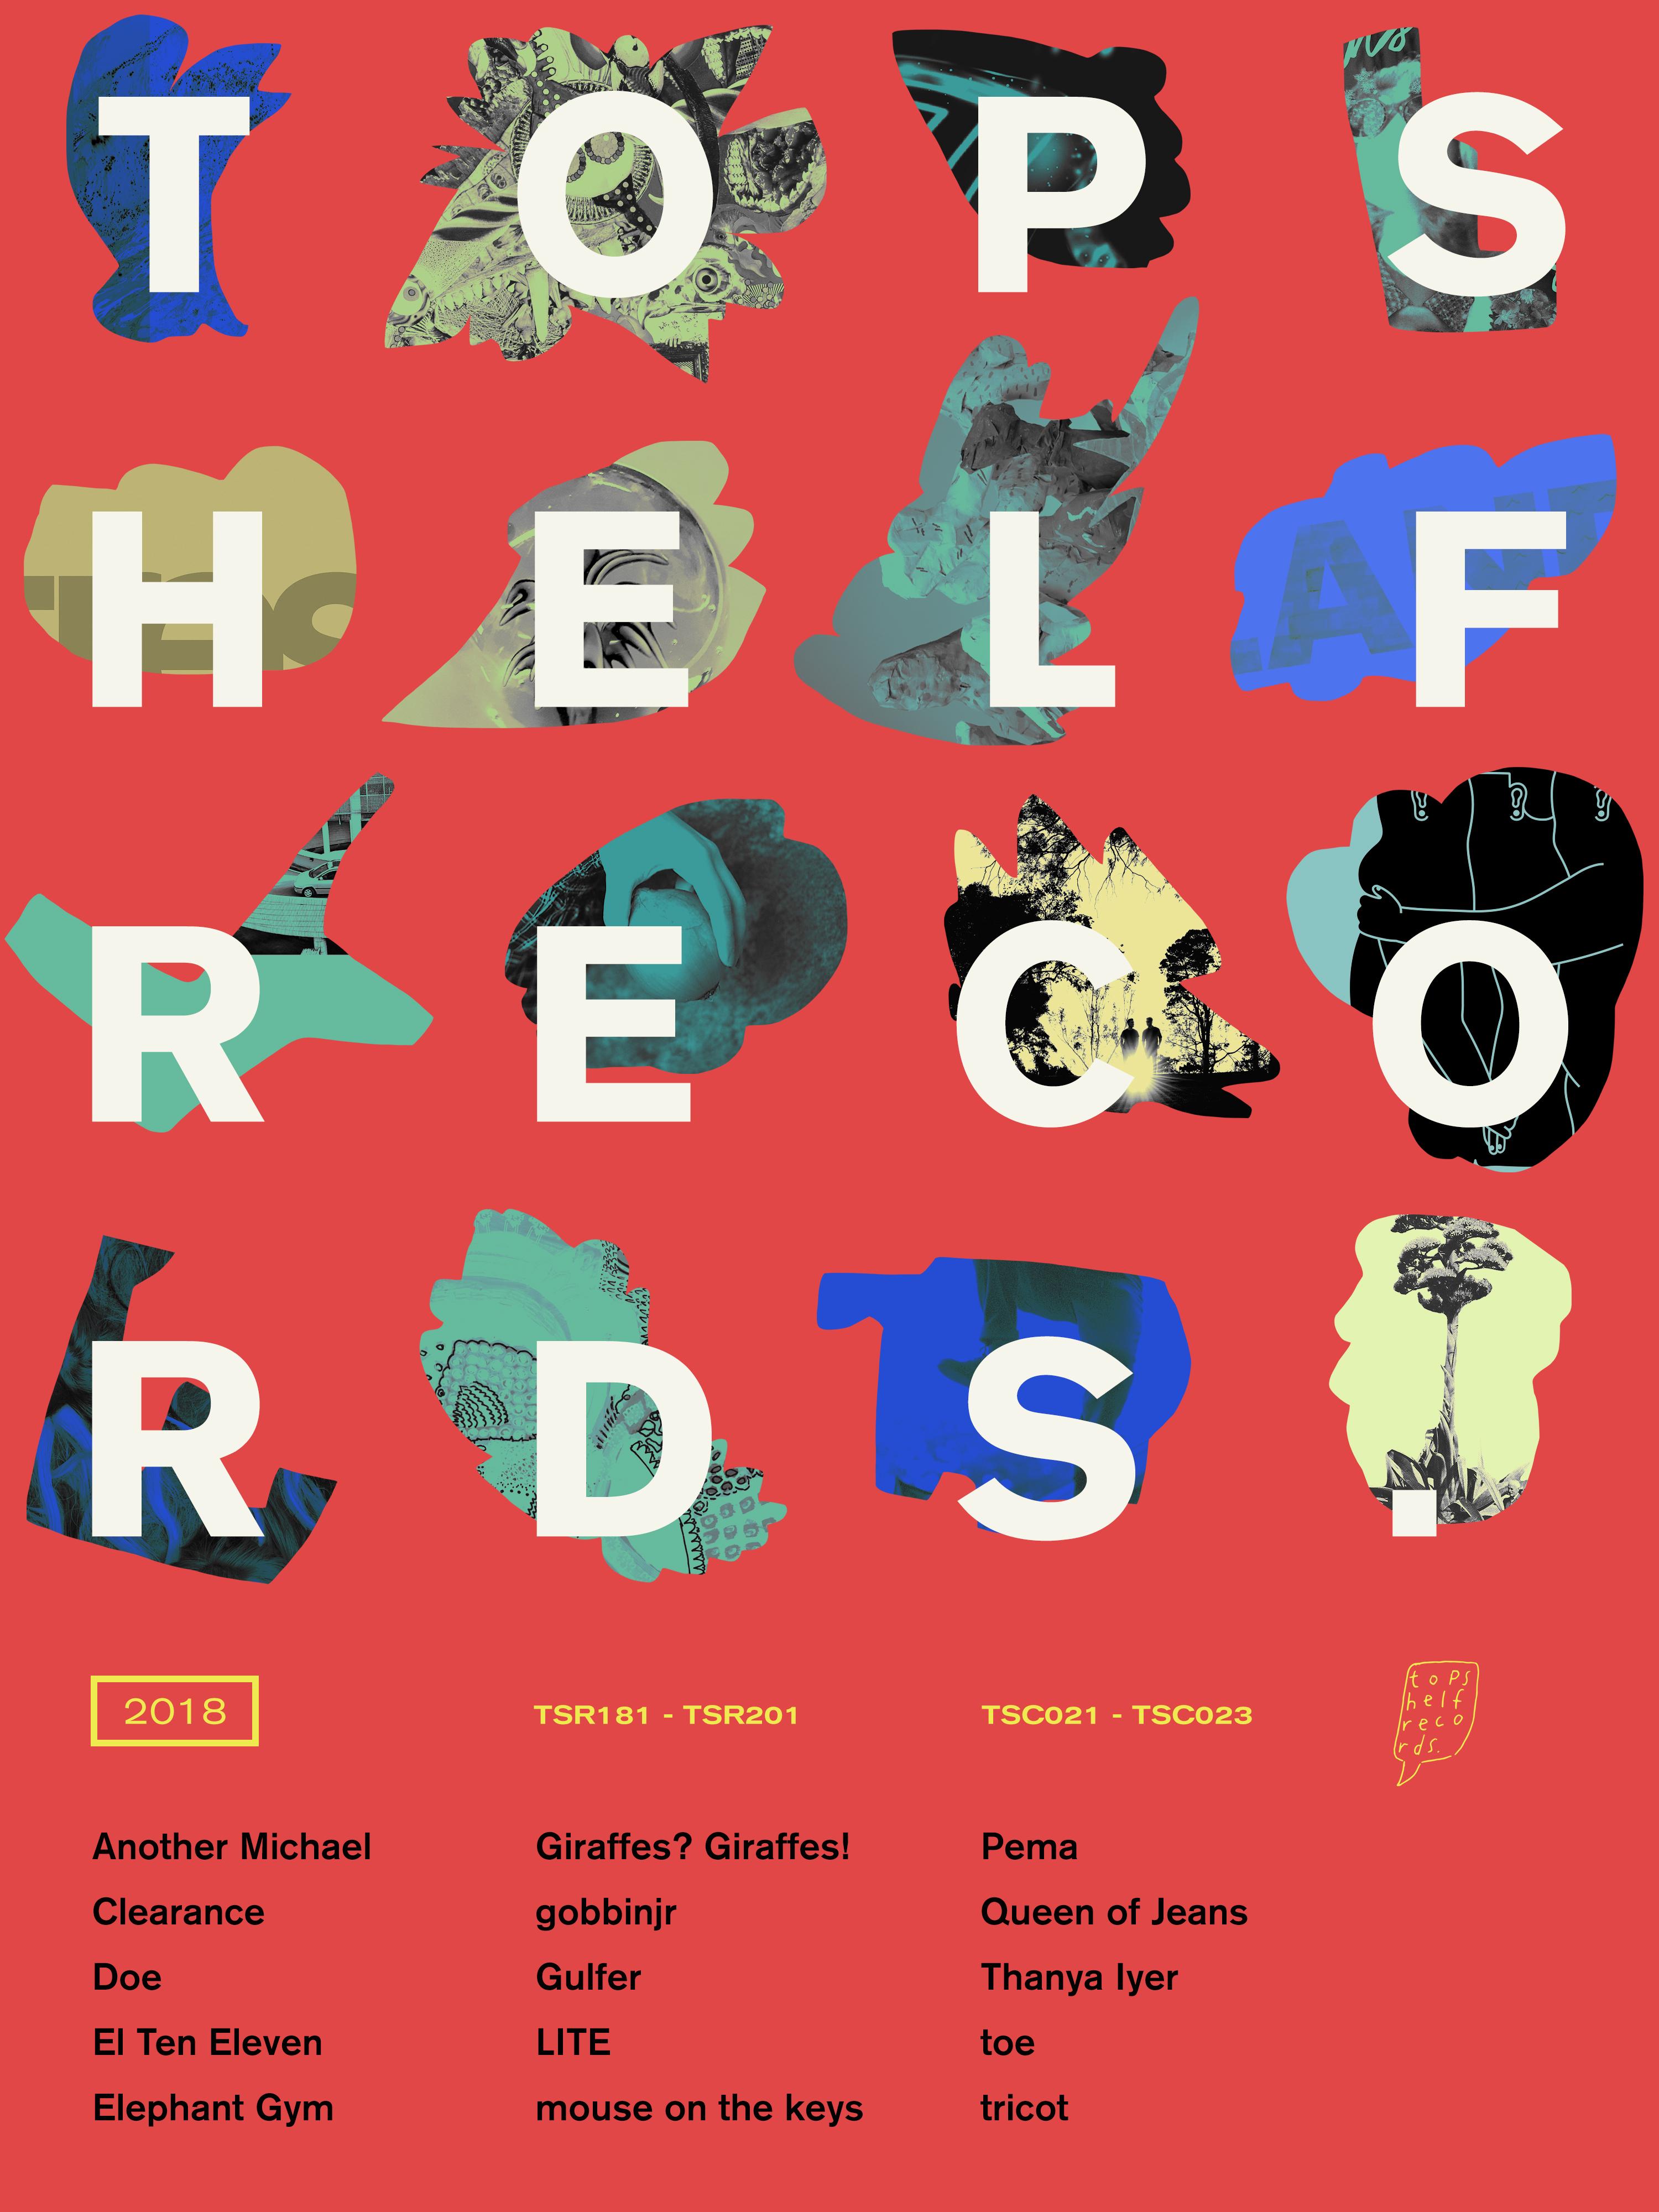 Topshelf Records - News